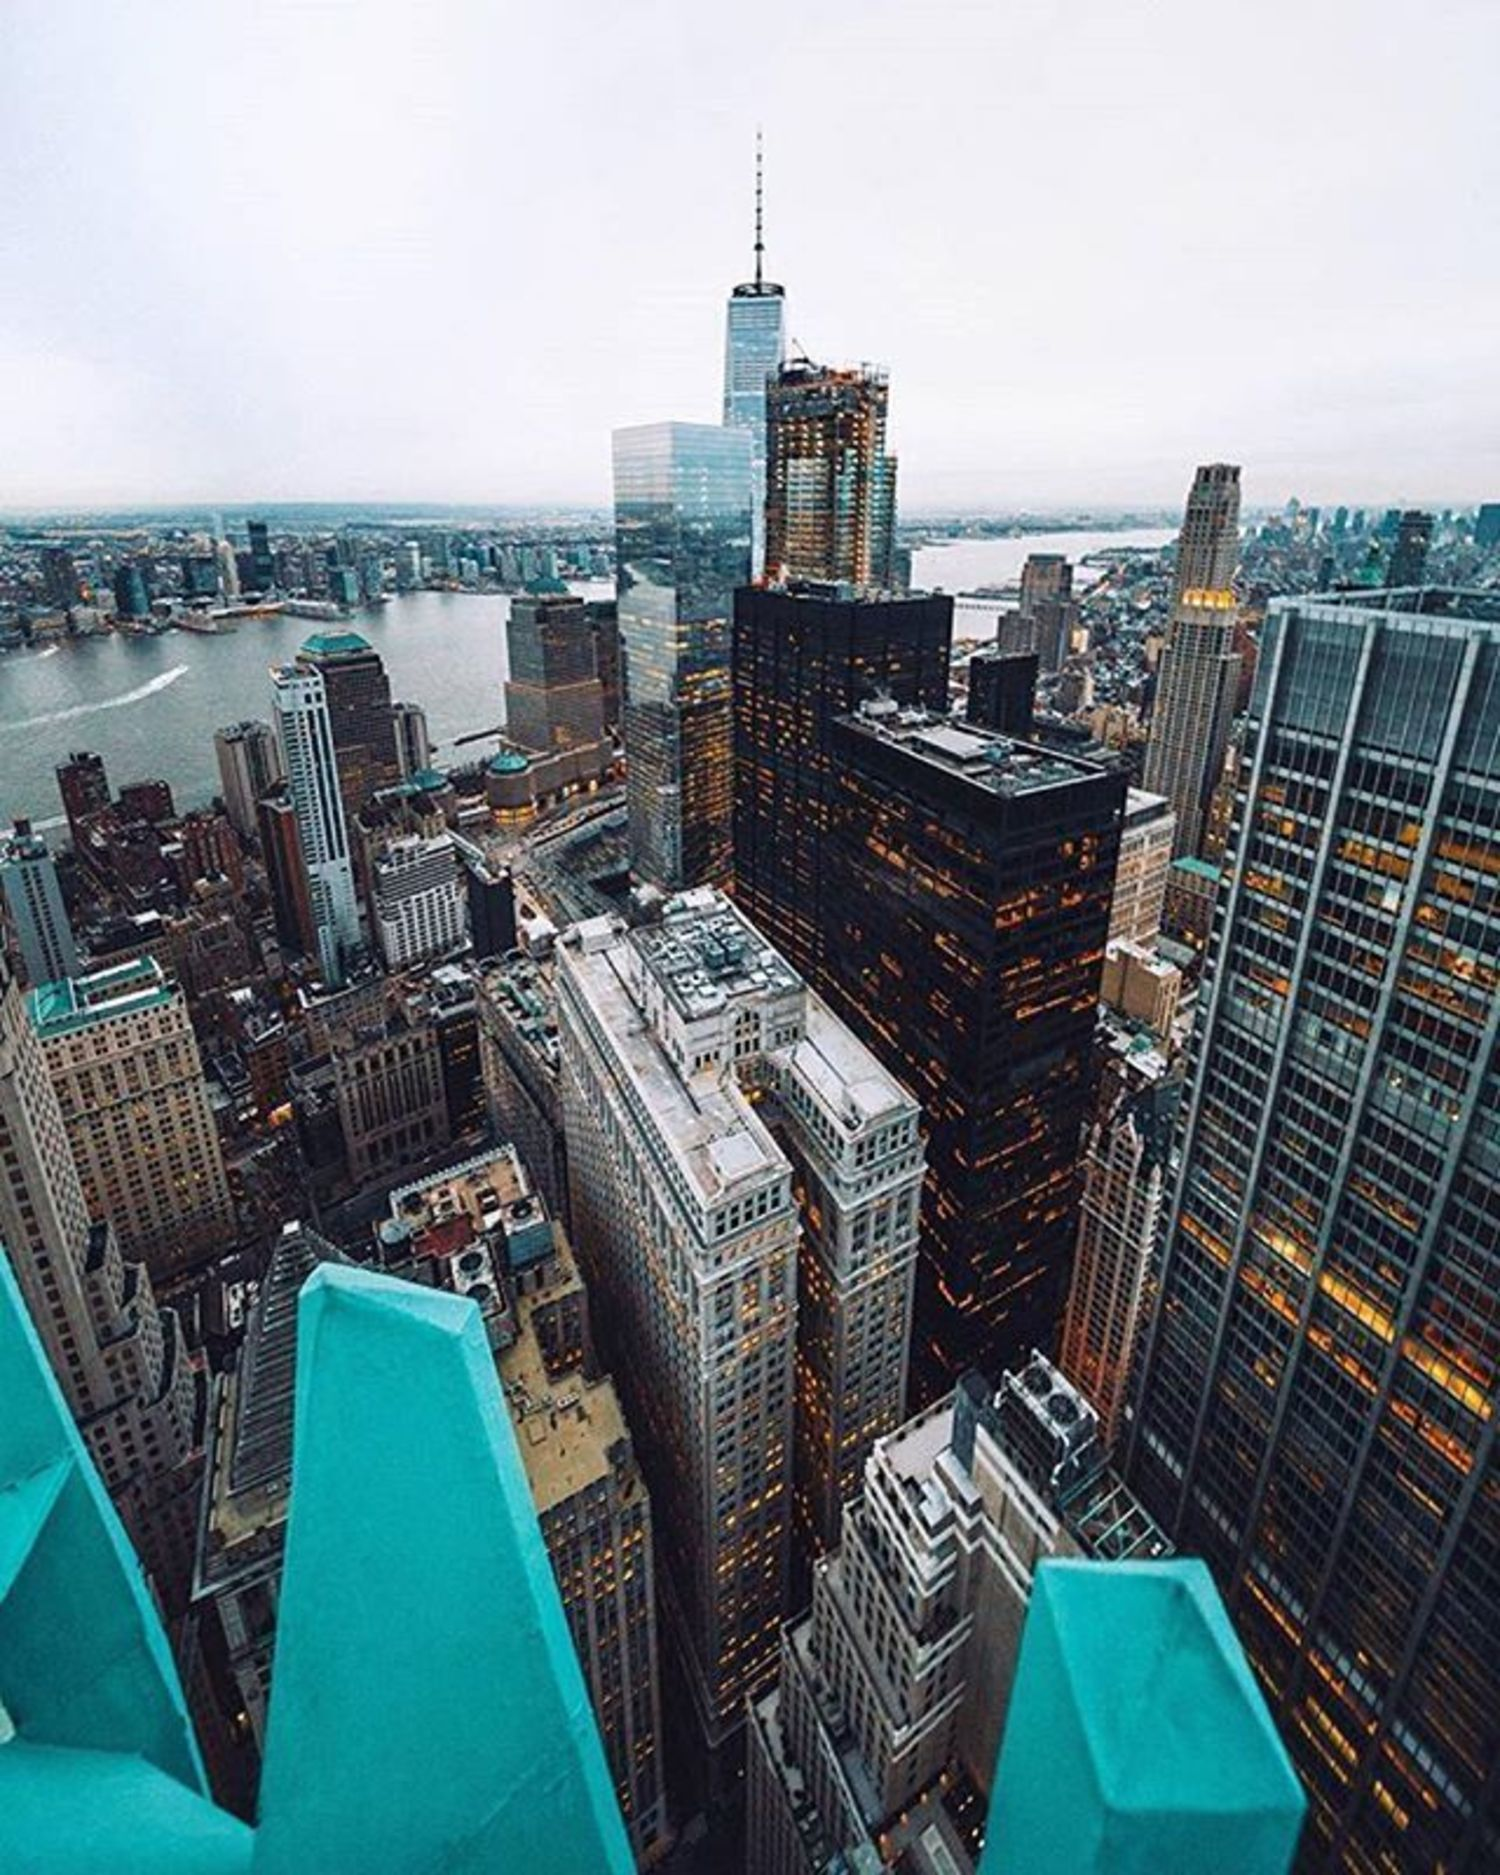 New York, New York. Photo via @svvvk #viewingnyc #newyorkcity #newyork